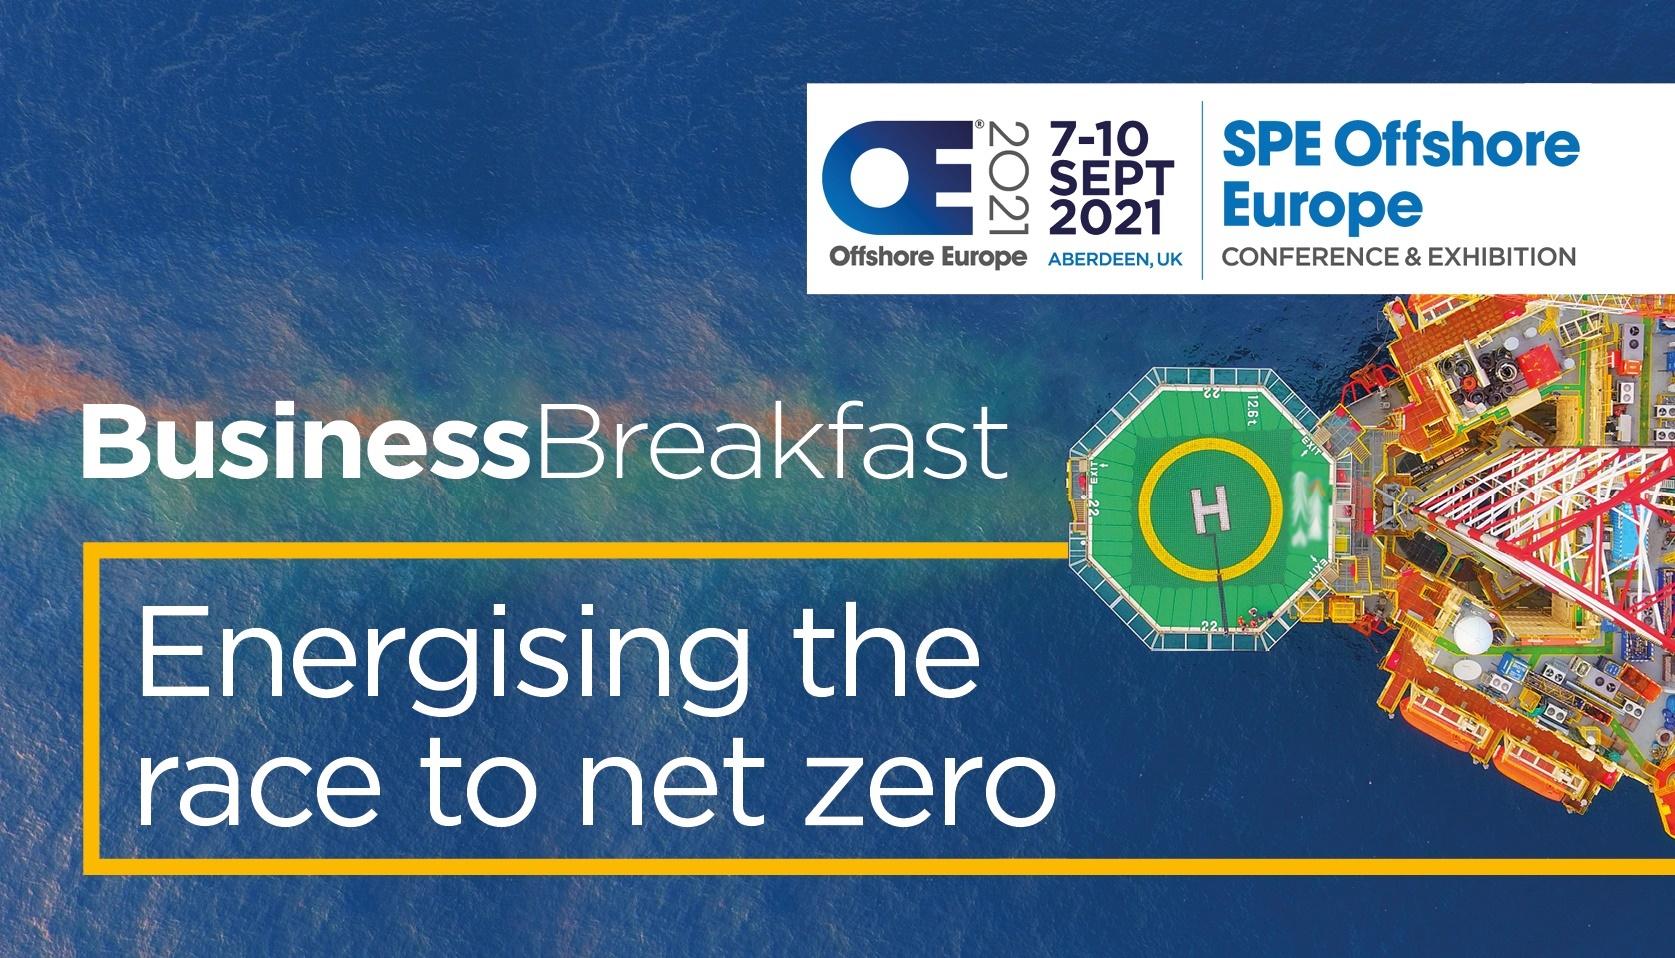 Business Breakfast - Energising the race to net zero